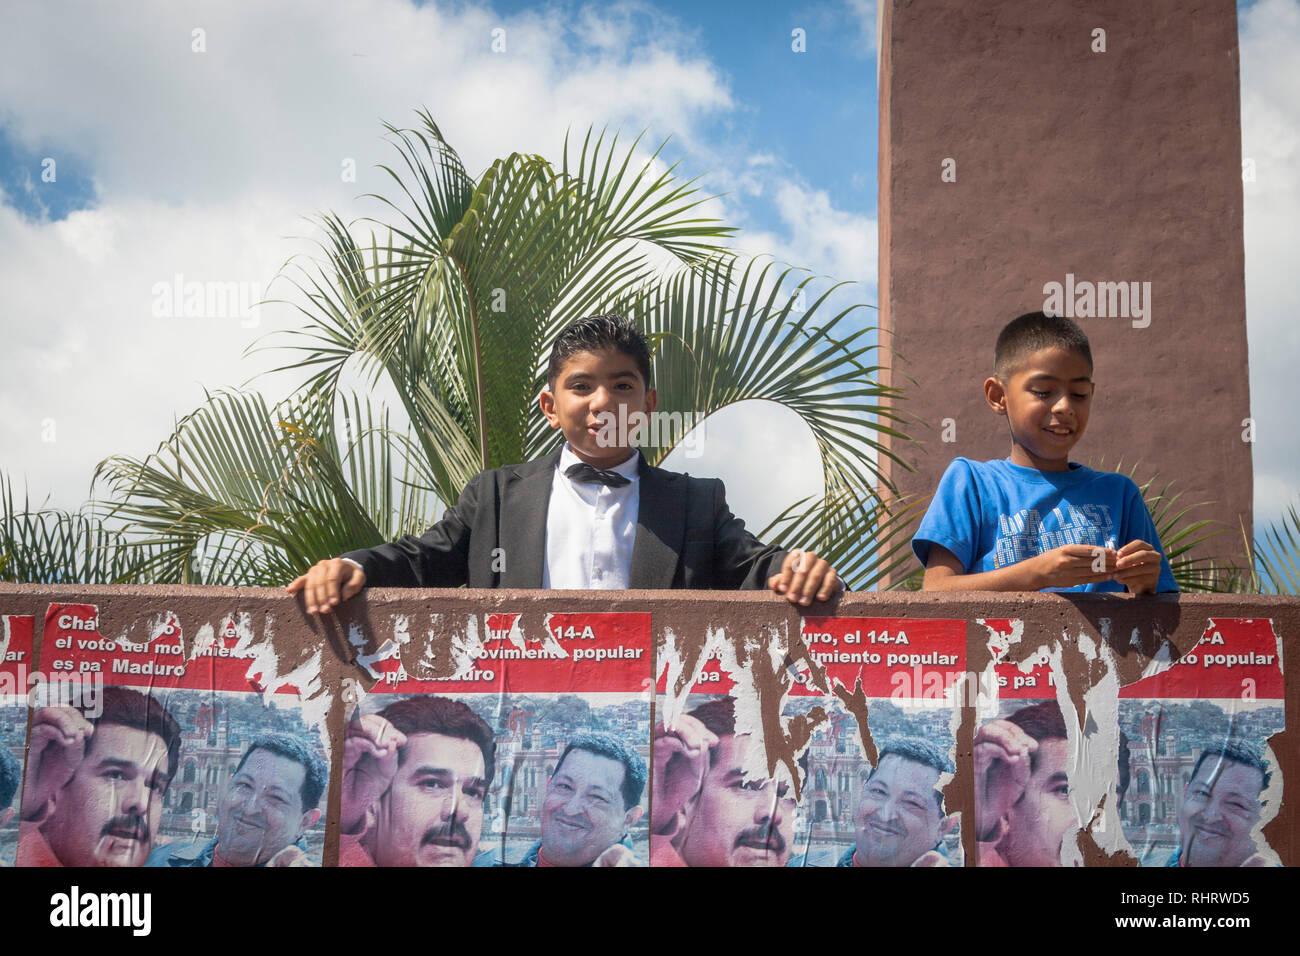 Caracas, Dtto Capital / Venezuela - 03/05/2013. Two boys smile and some Nicolas Maduro and Hugo Chávez political propaganda in Catia neighborhood. - Stock Image